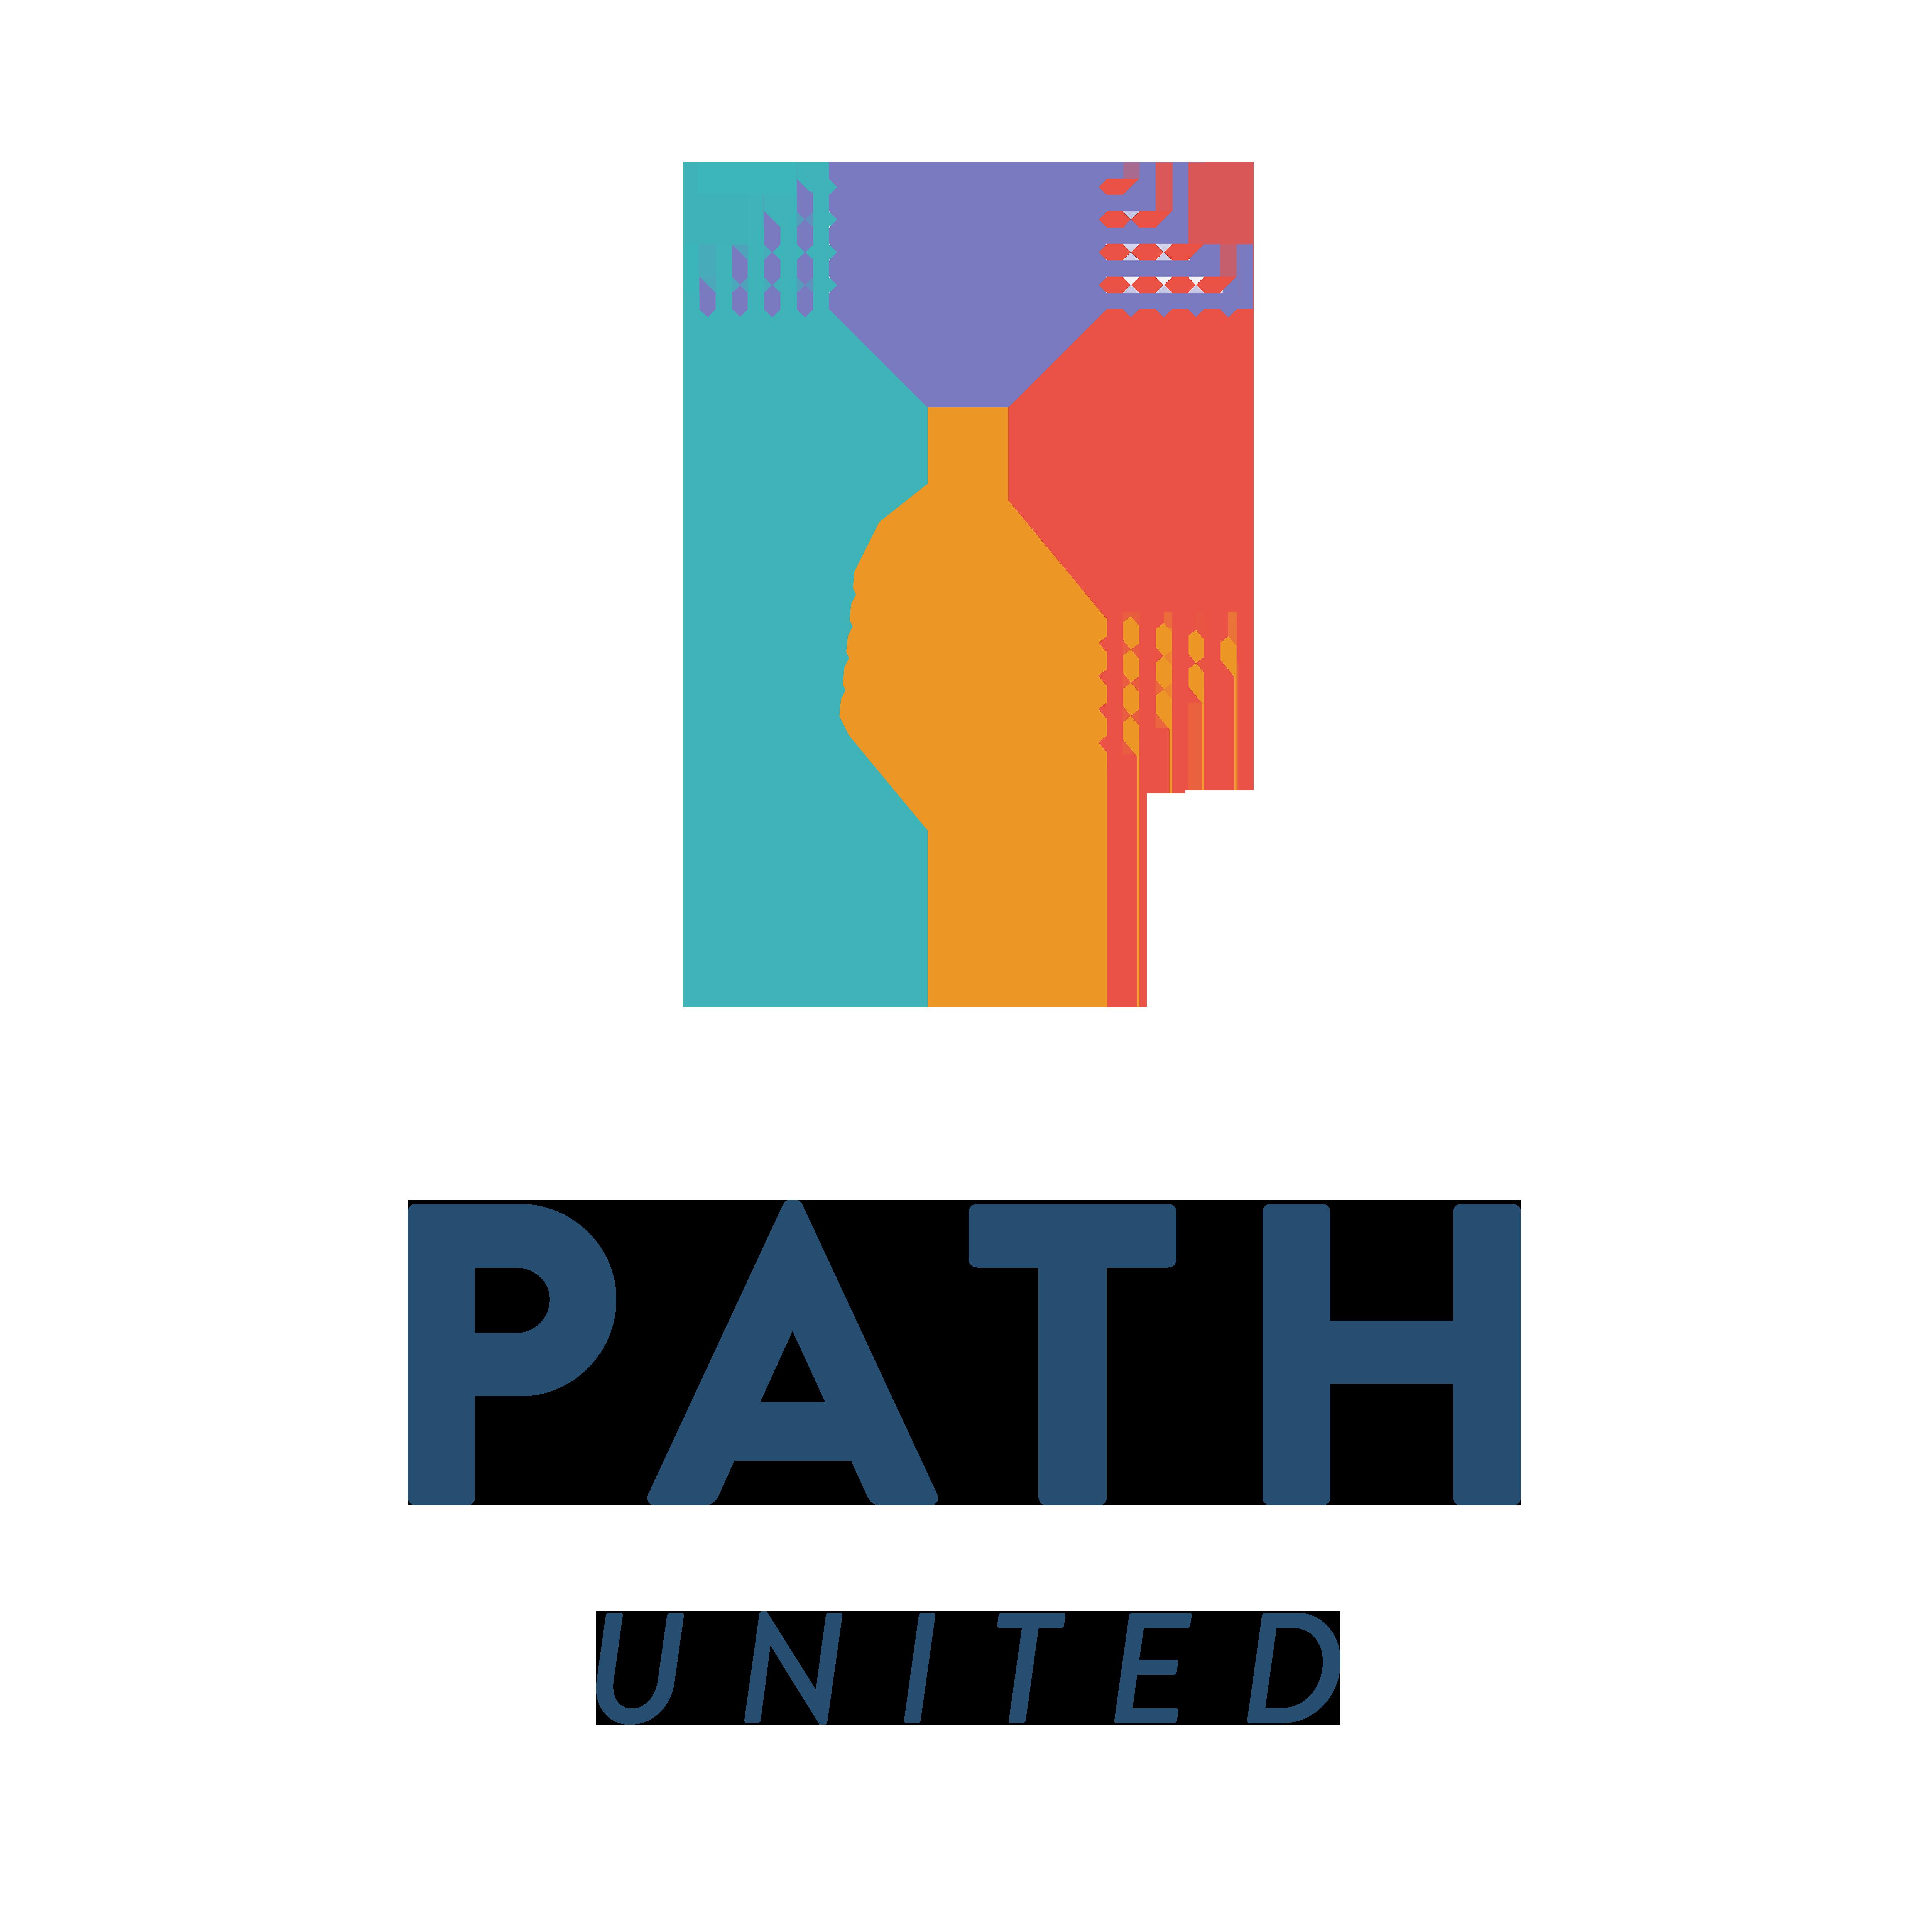 Path United